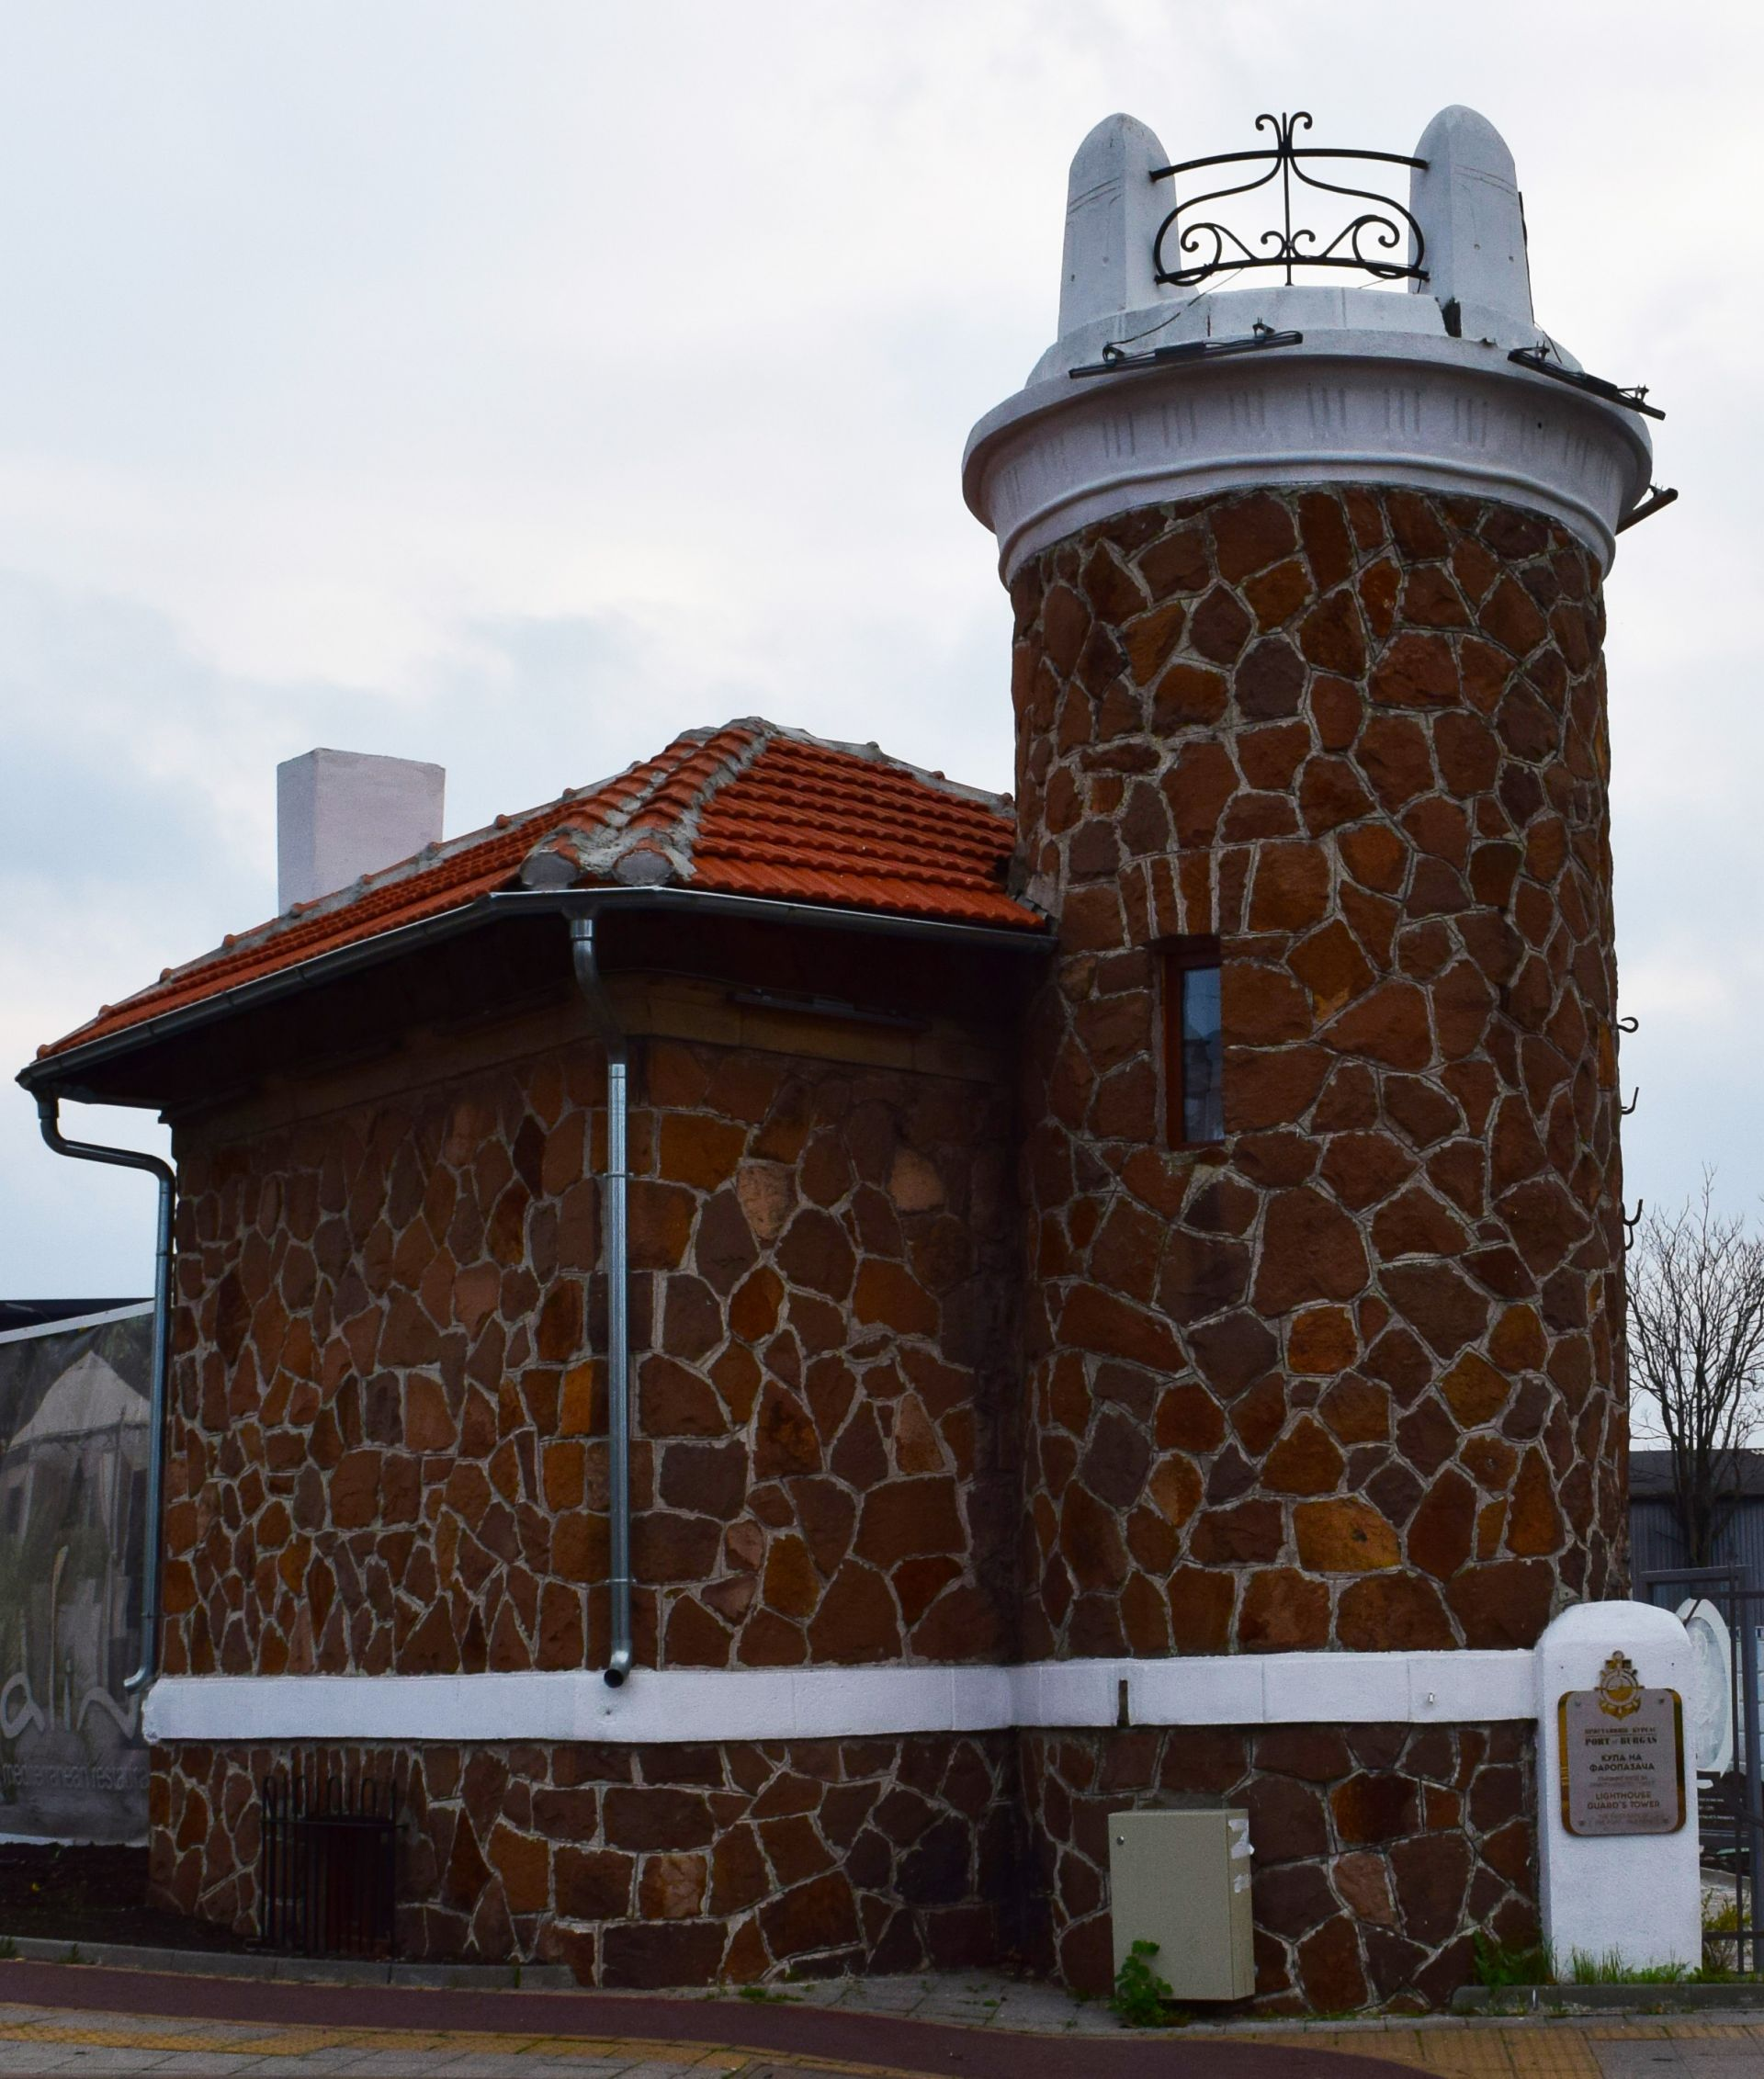 Култа на фаропазача в пристанище Бургас отваря врати на Никулден  - 26.11.2019